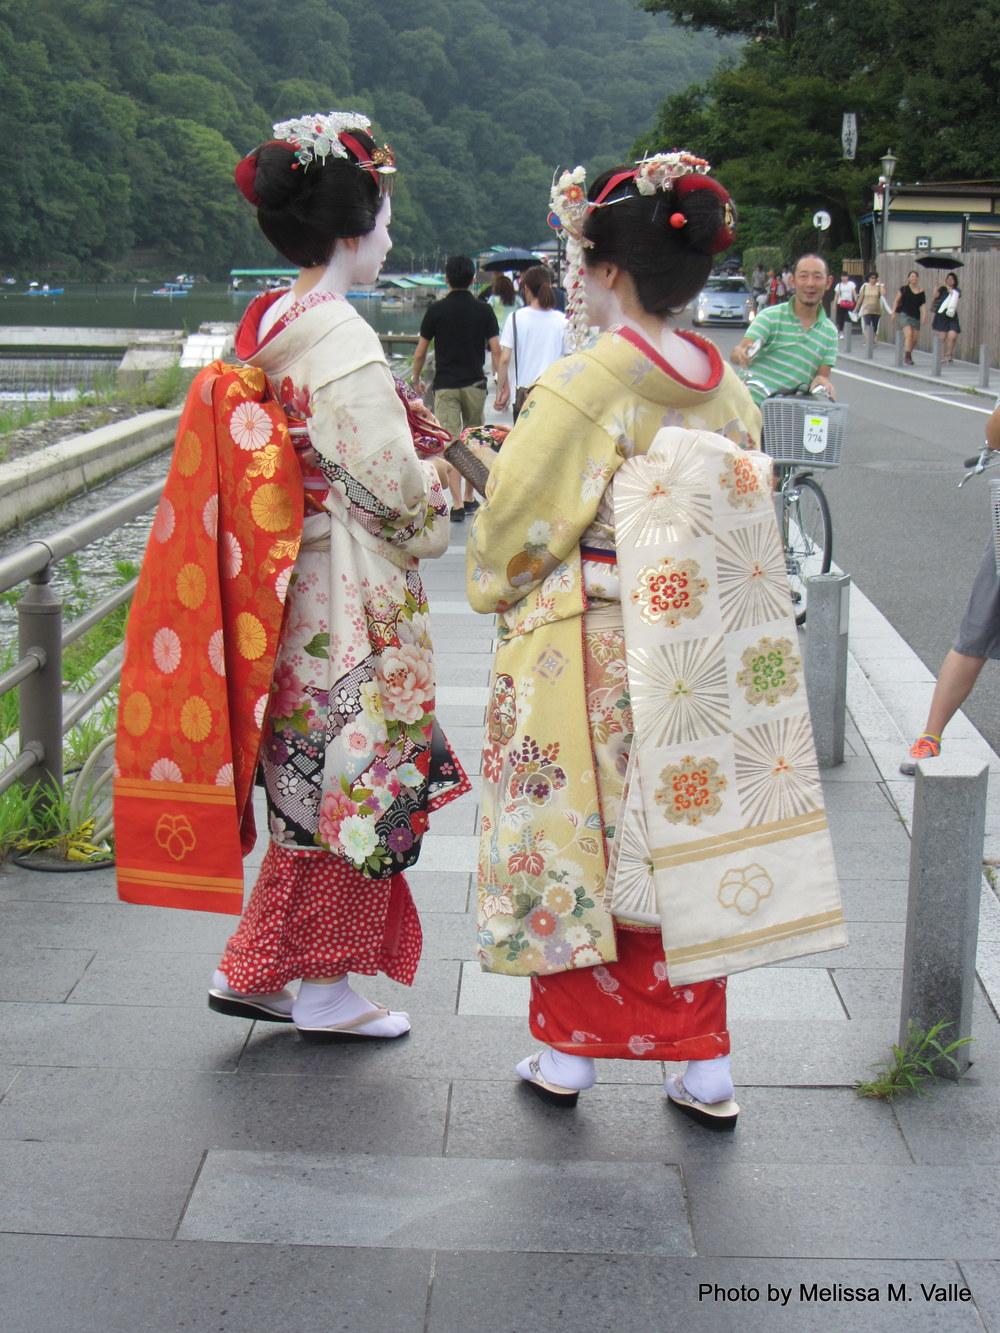 Women in traditional dress in Arashiyama